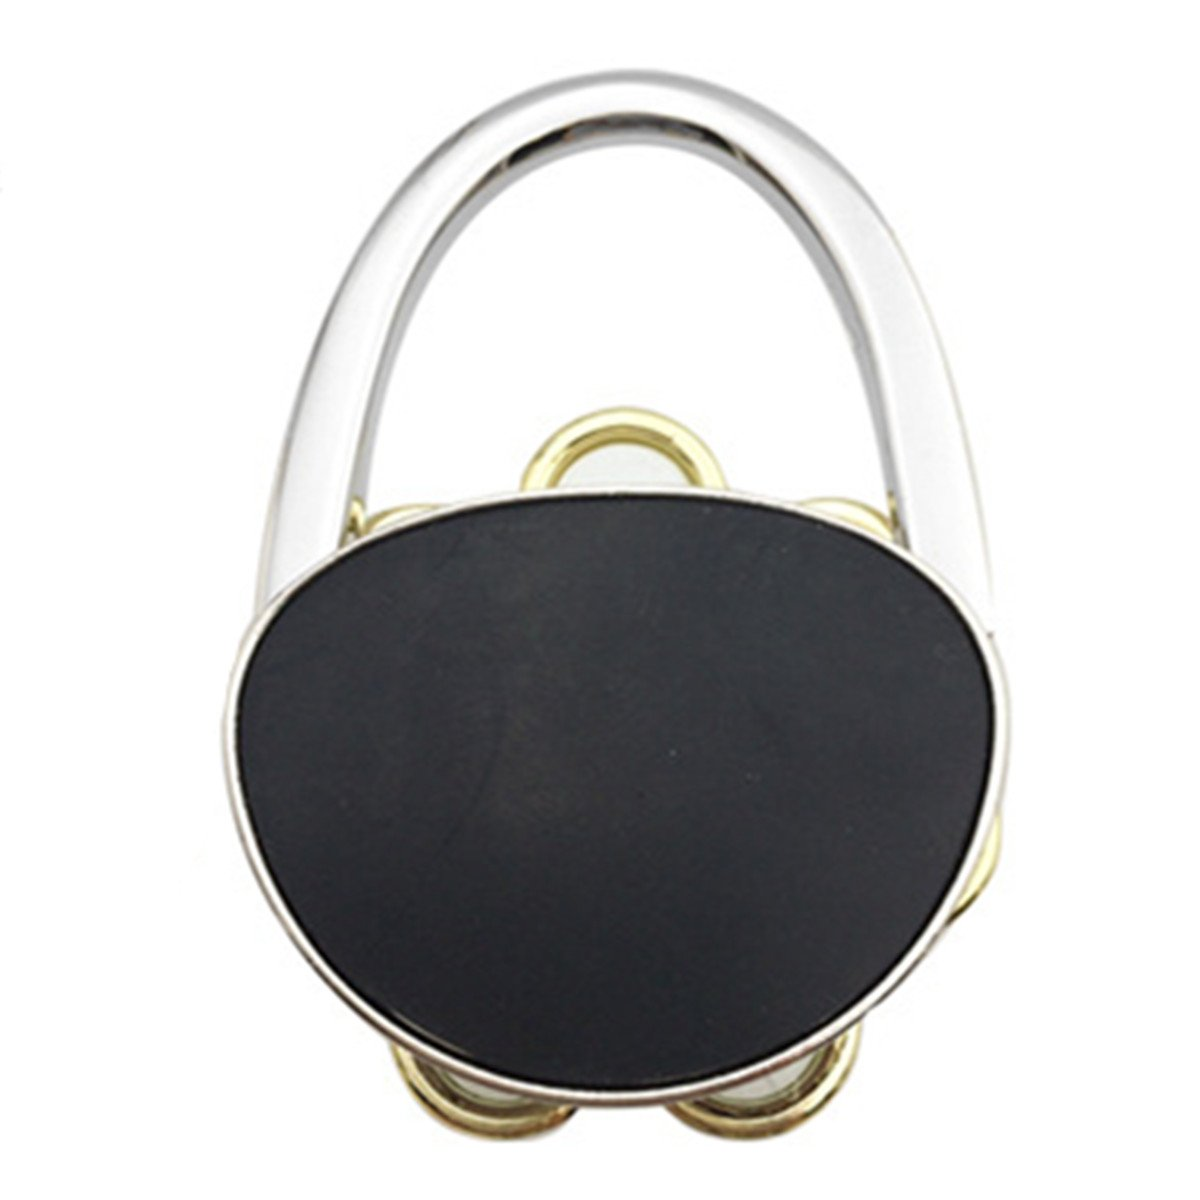 Reizteko Purse Hook, Sun Flower Foldable Handbag Purse Hanger Hook Holder for Tables (Pack of 11)